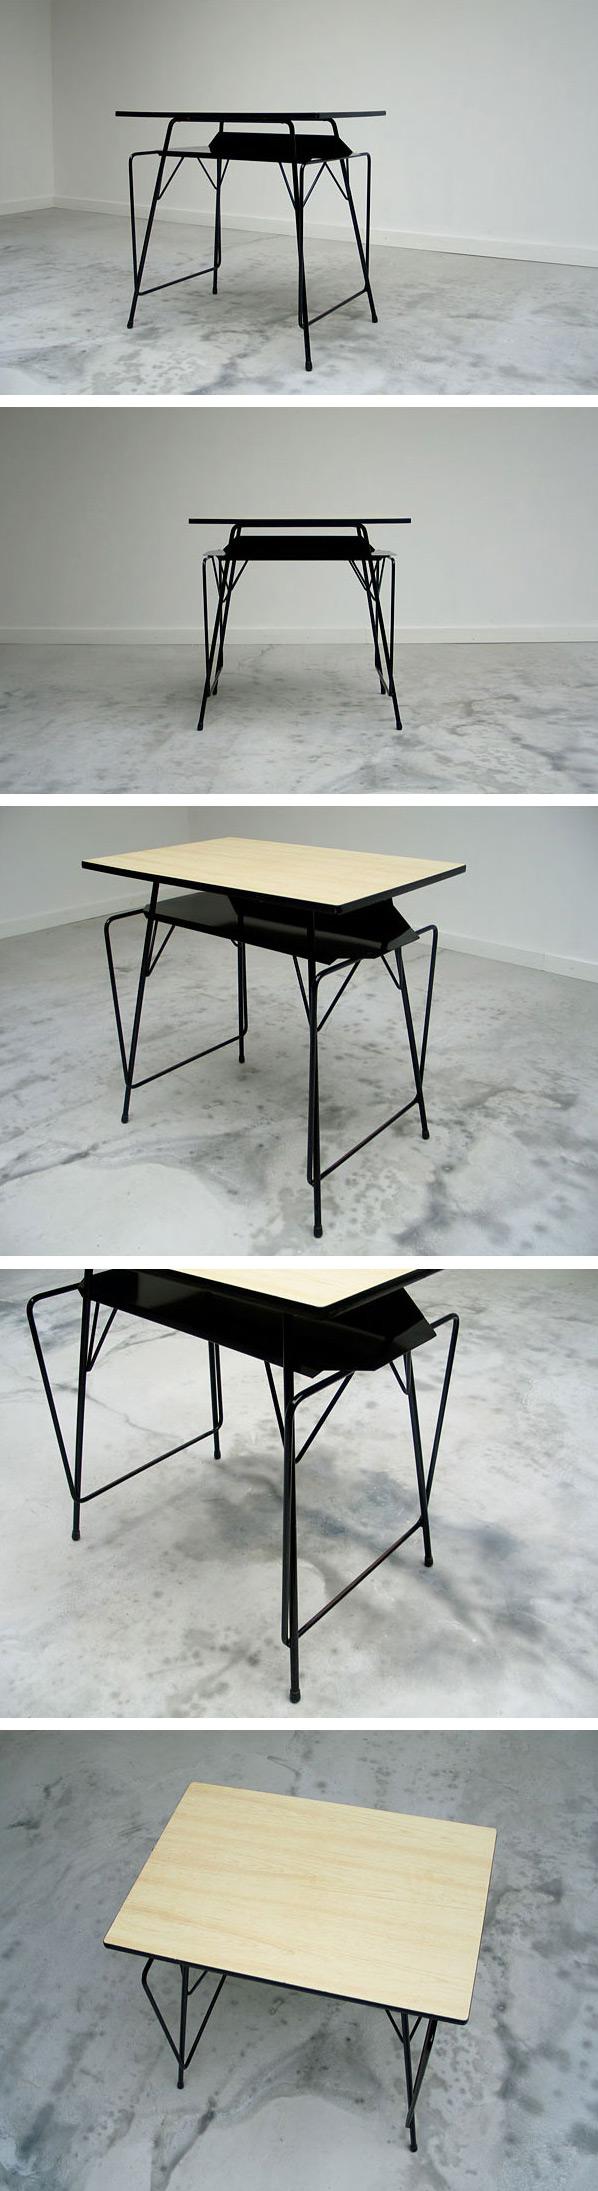 Modern student writing table Willy Van Der Meeren 1950 Large